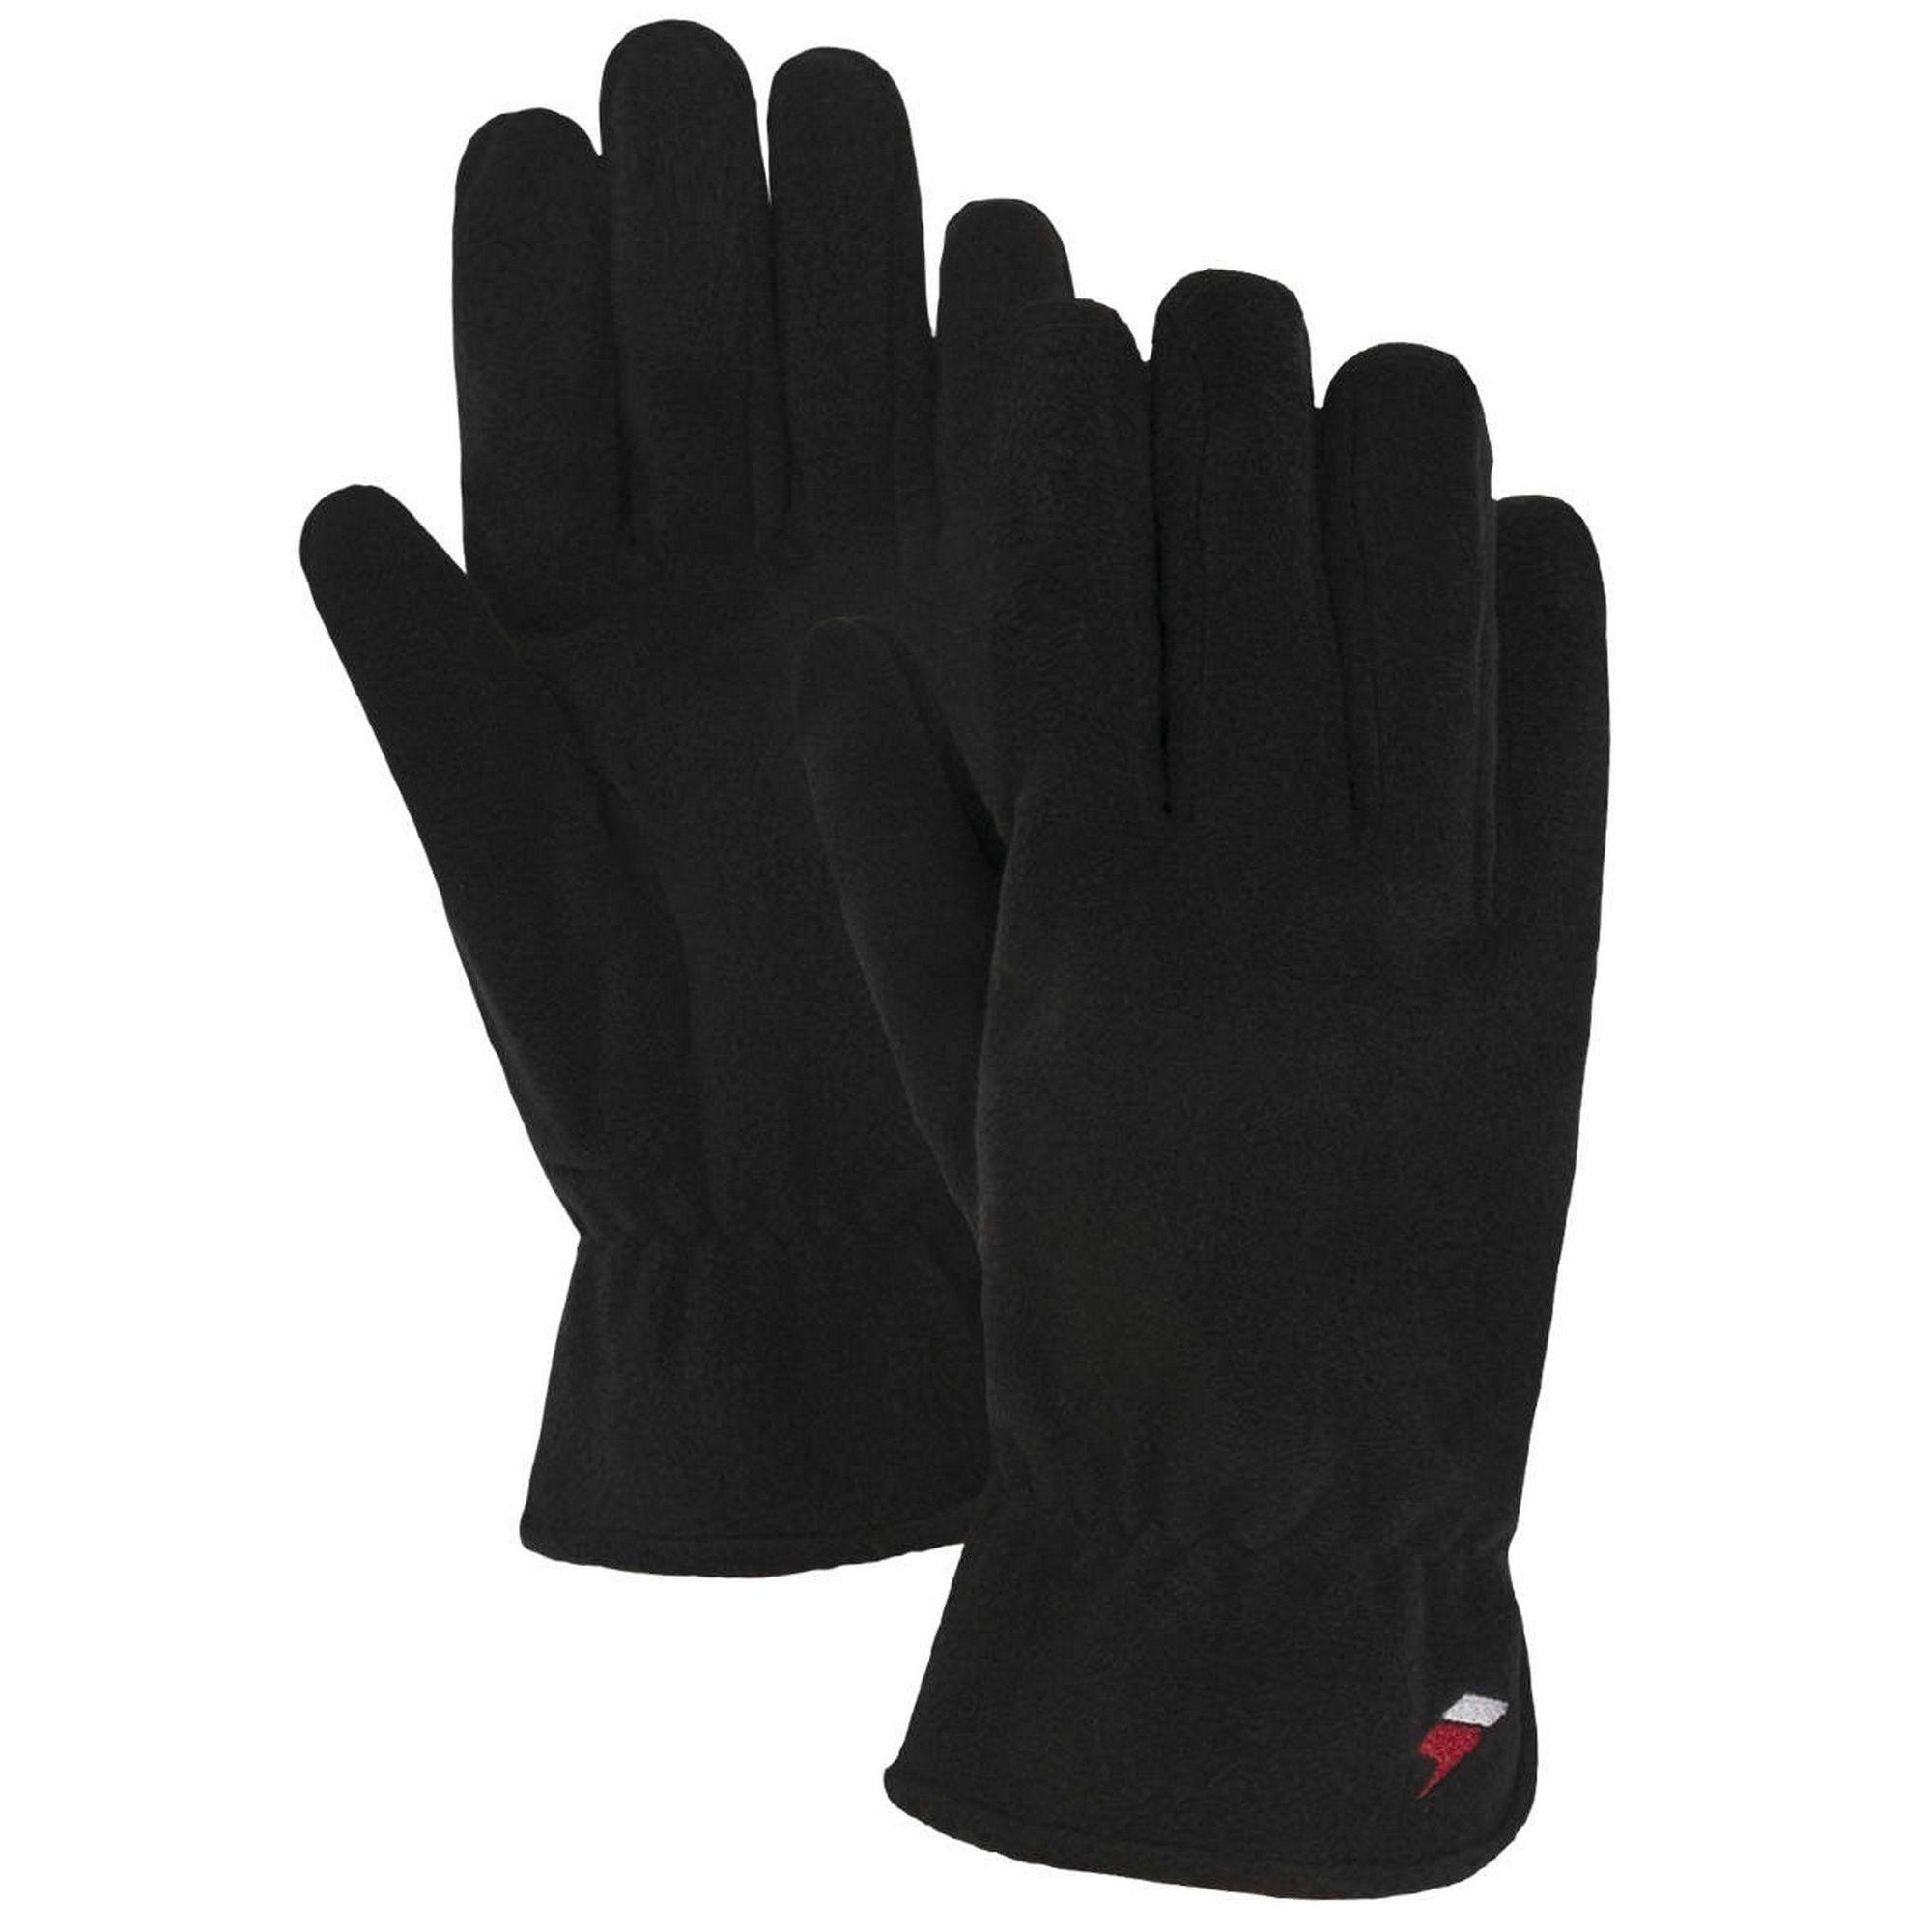 Trespass Womens/Ladies Plummet Fleece Gloves (Black)